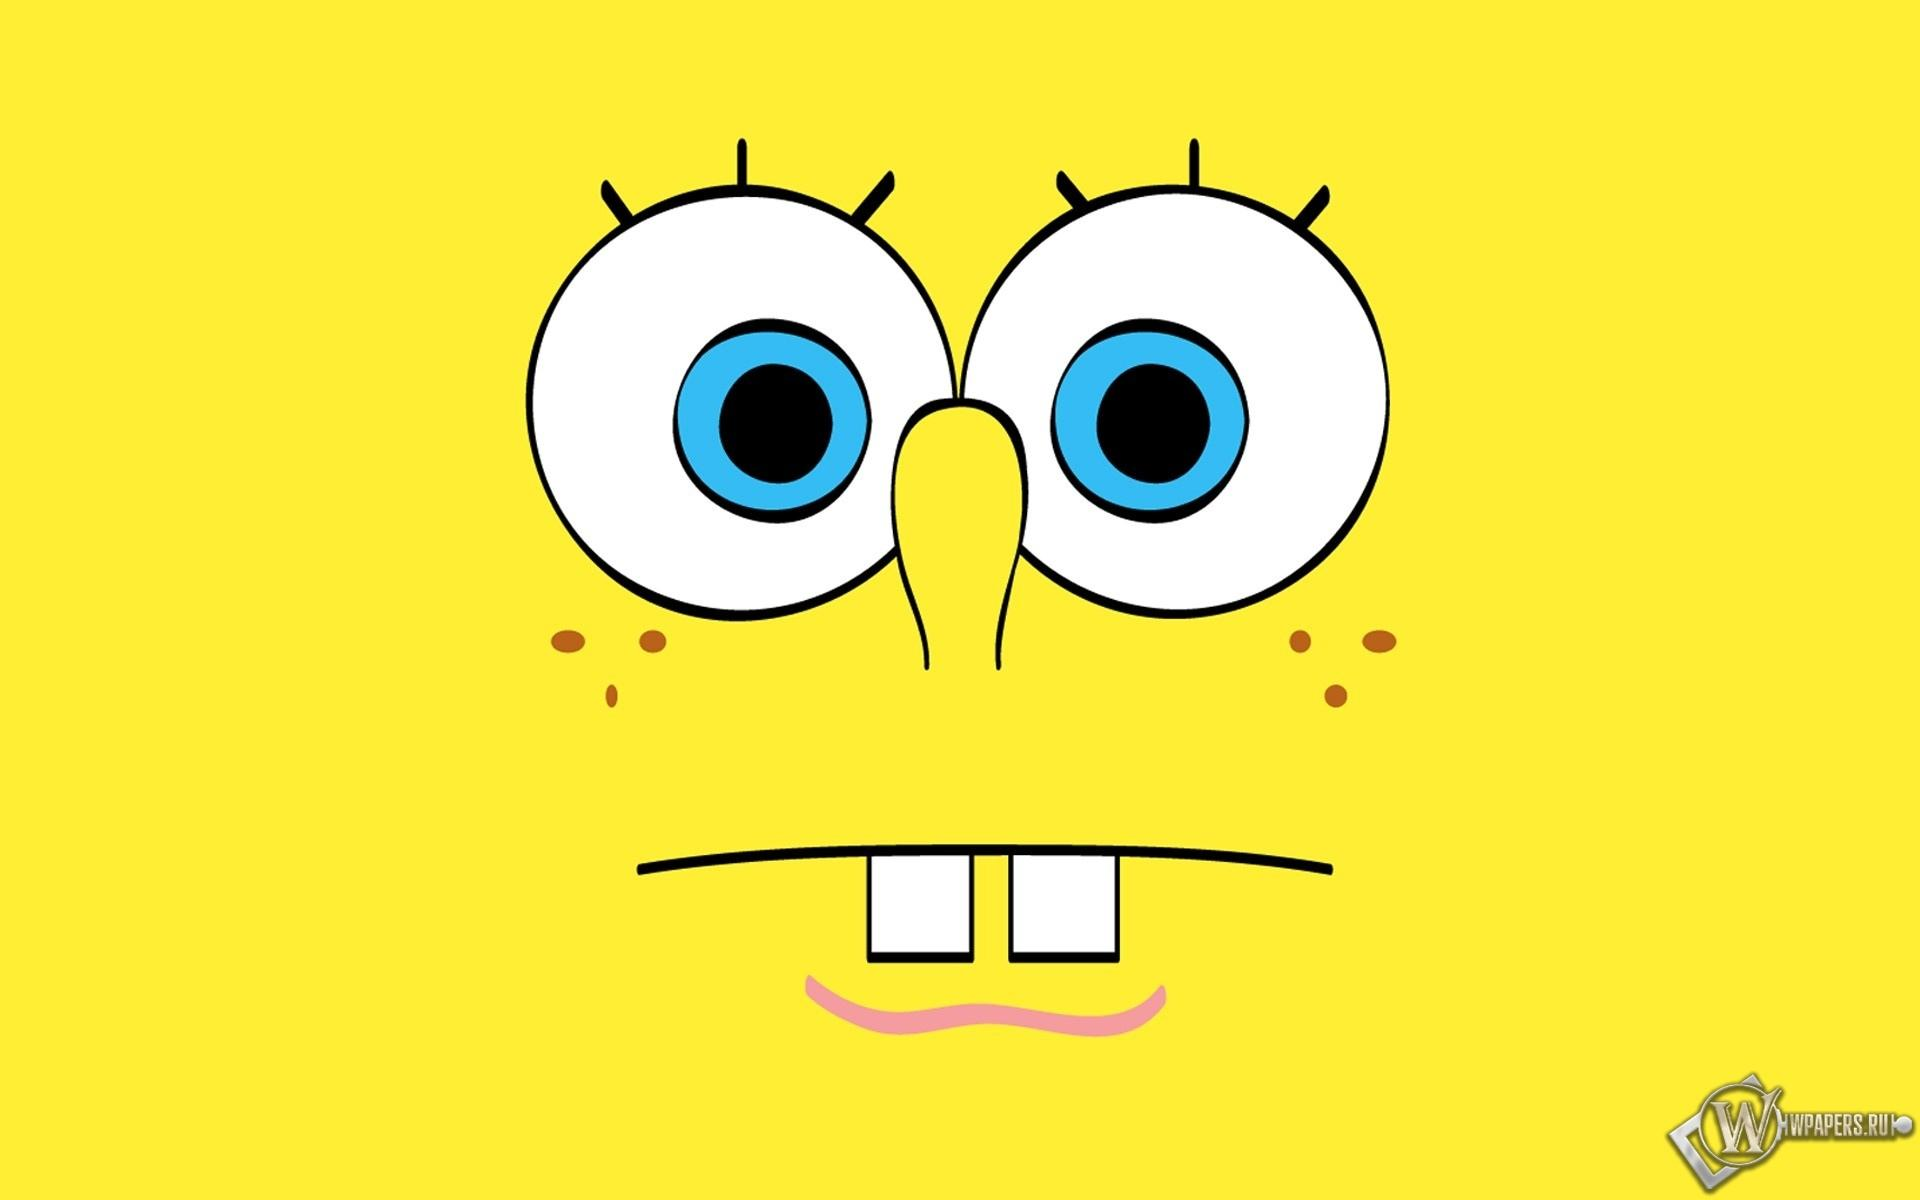 Spongebob Squarepants wallpapers HD quality